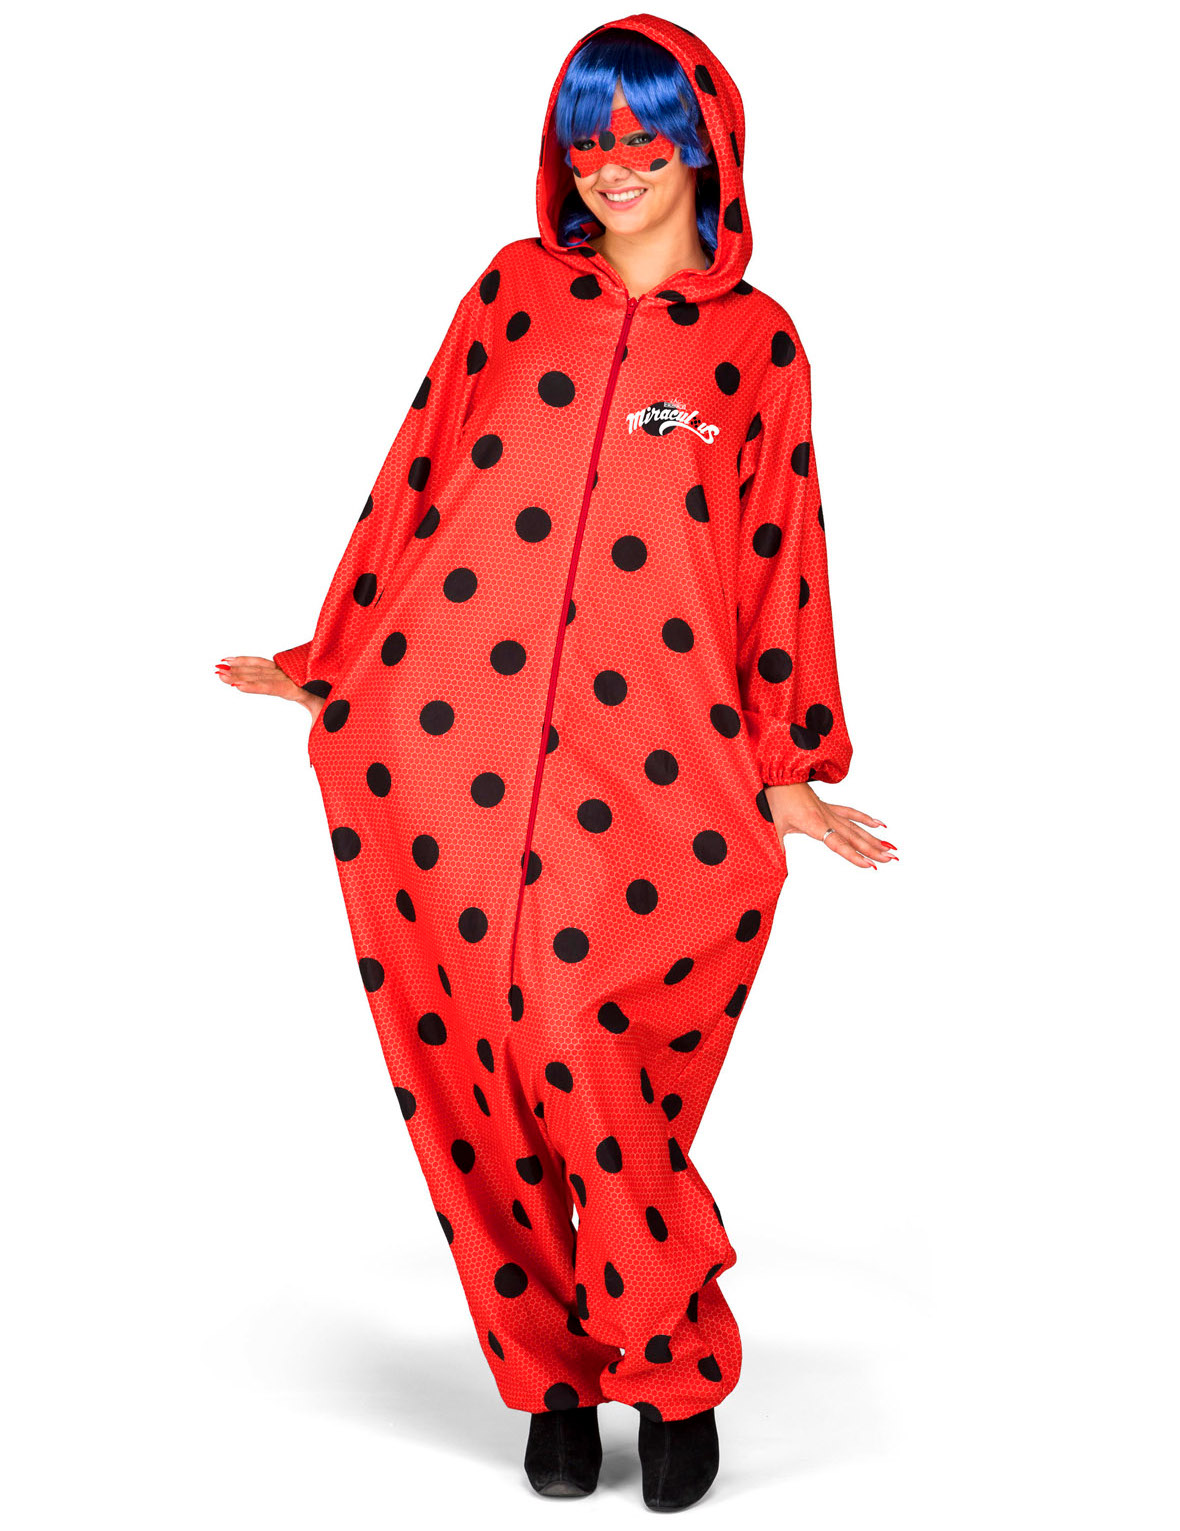 ladybug kost m einteiler f r erwachsene kost me f r. Black Bedroom Furniture Sets. Home Design Ideas